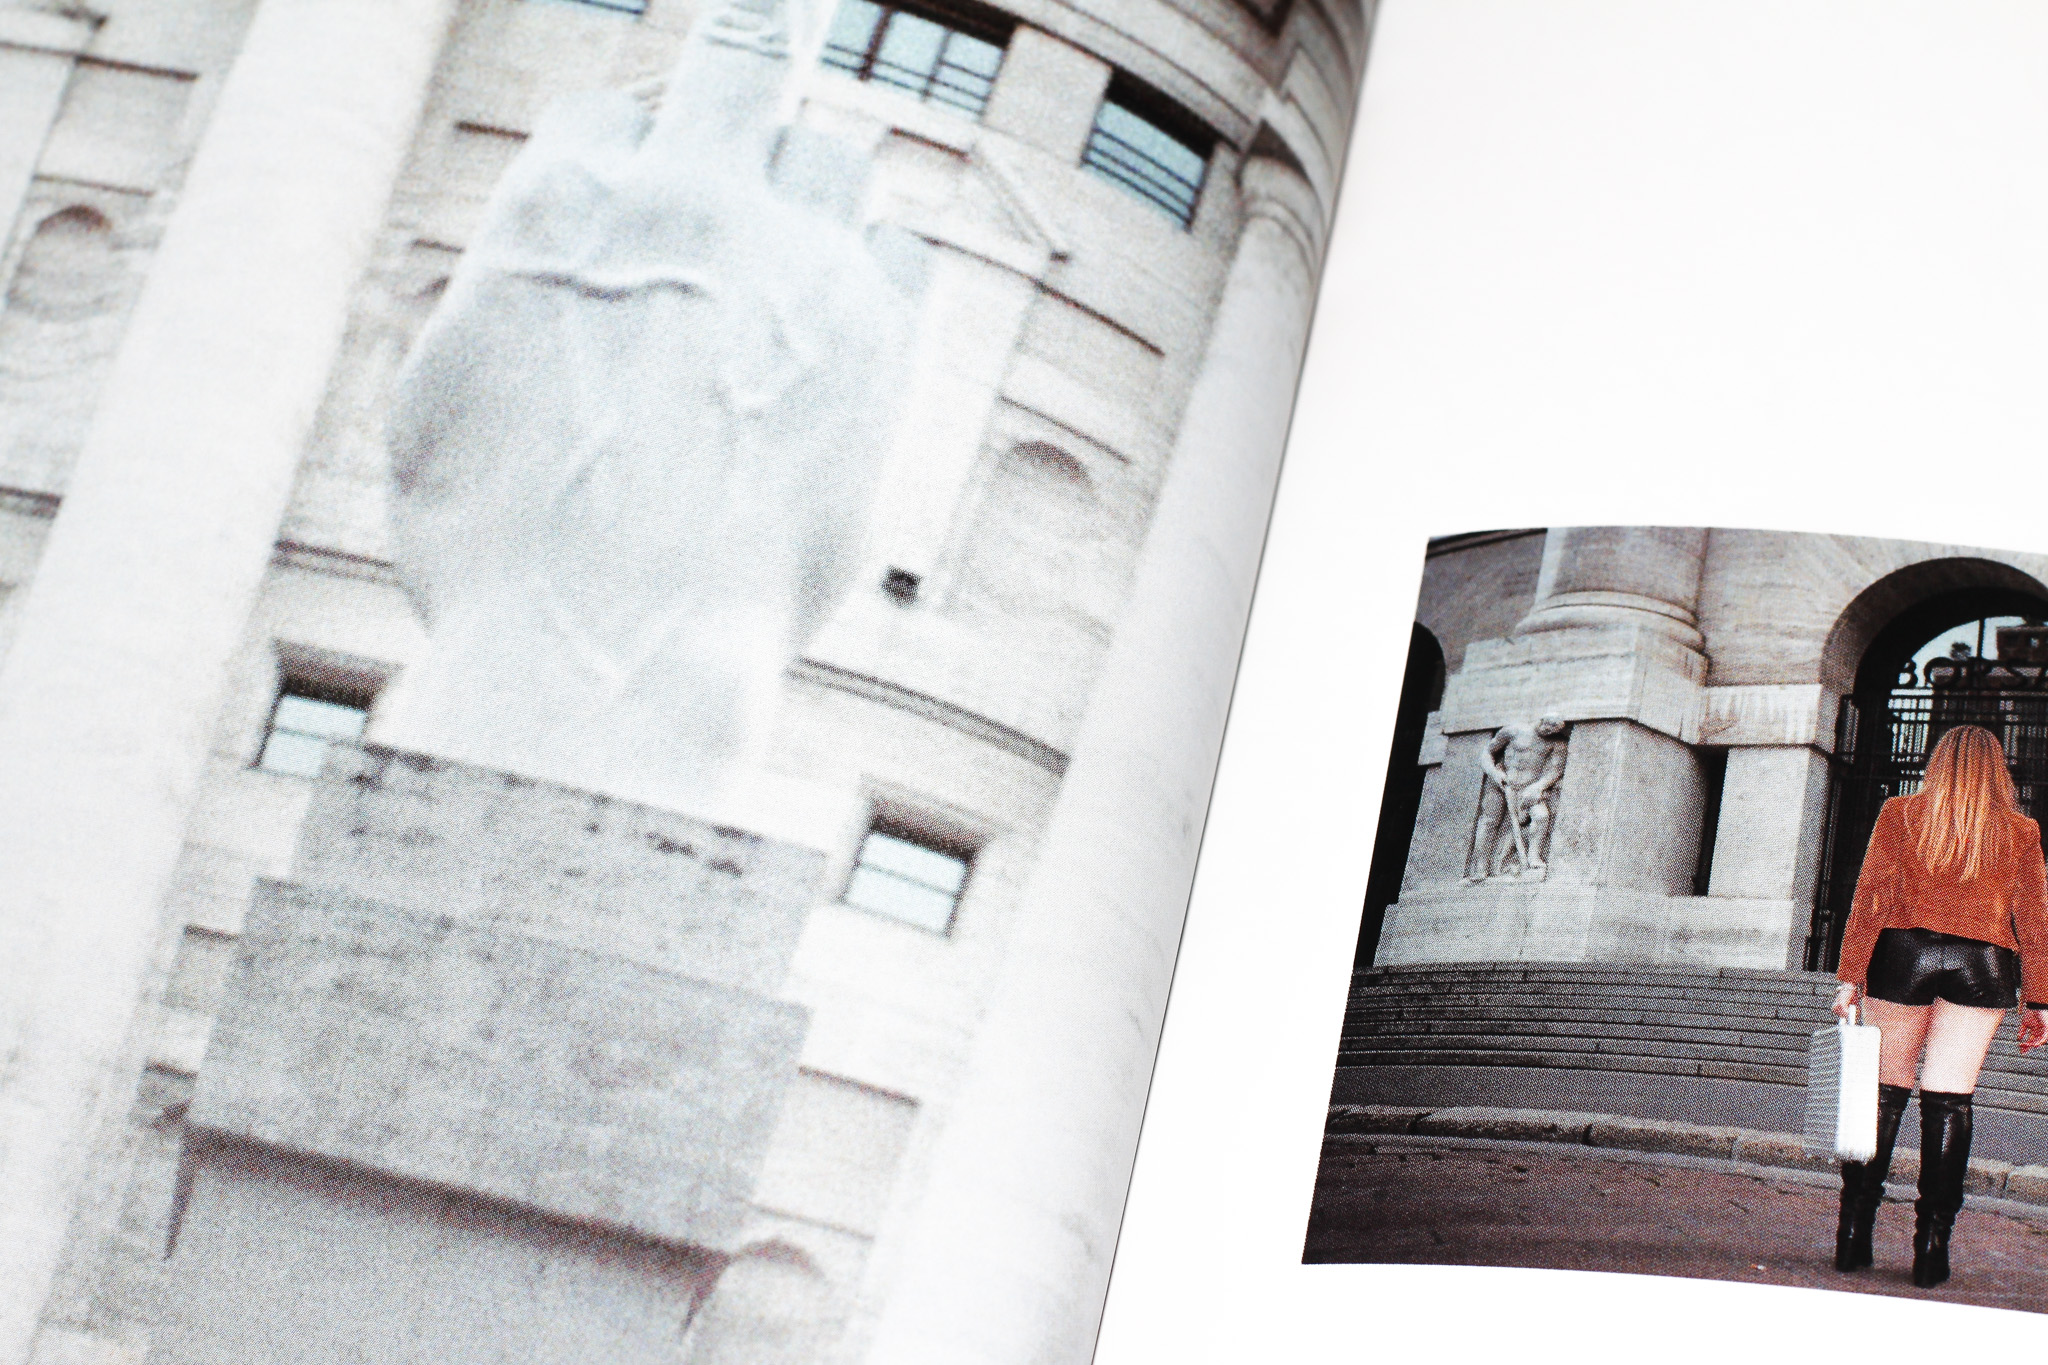 myss-keta-fanzine-rfm-4.jpg